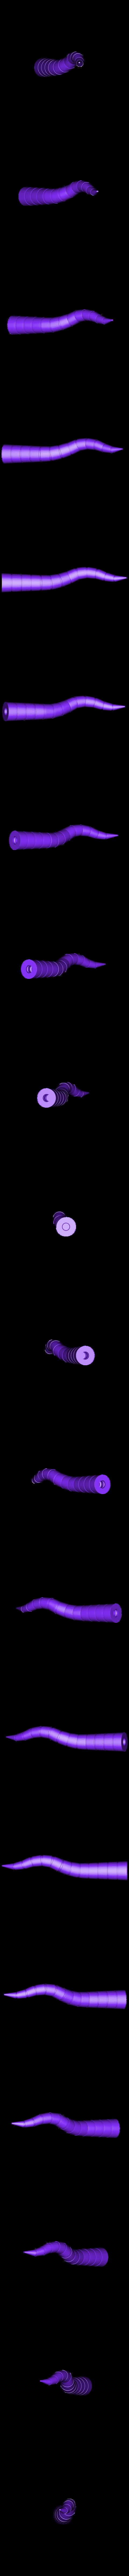 tentacle_02.stl Download free STL file Gowanus Monster - Margo Series • 3D printable object, boldmachines